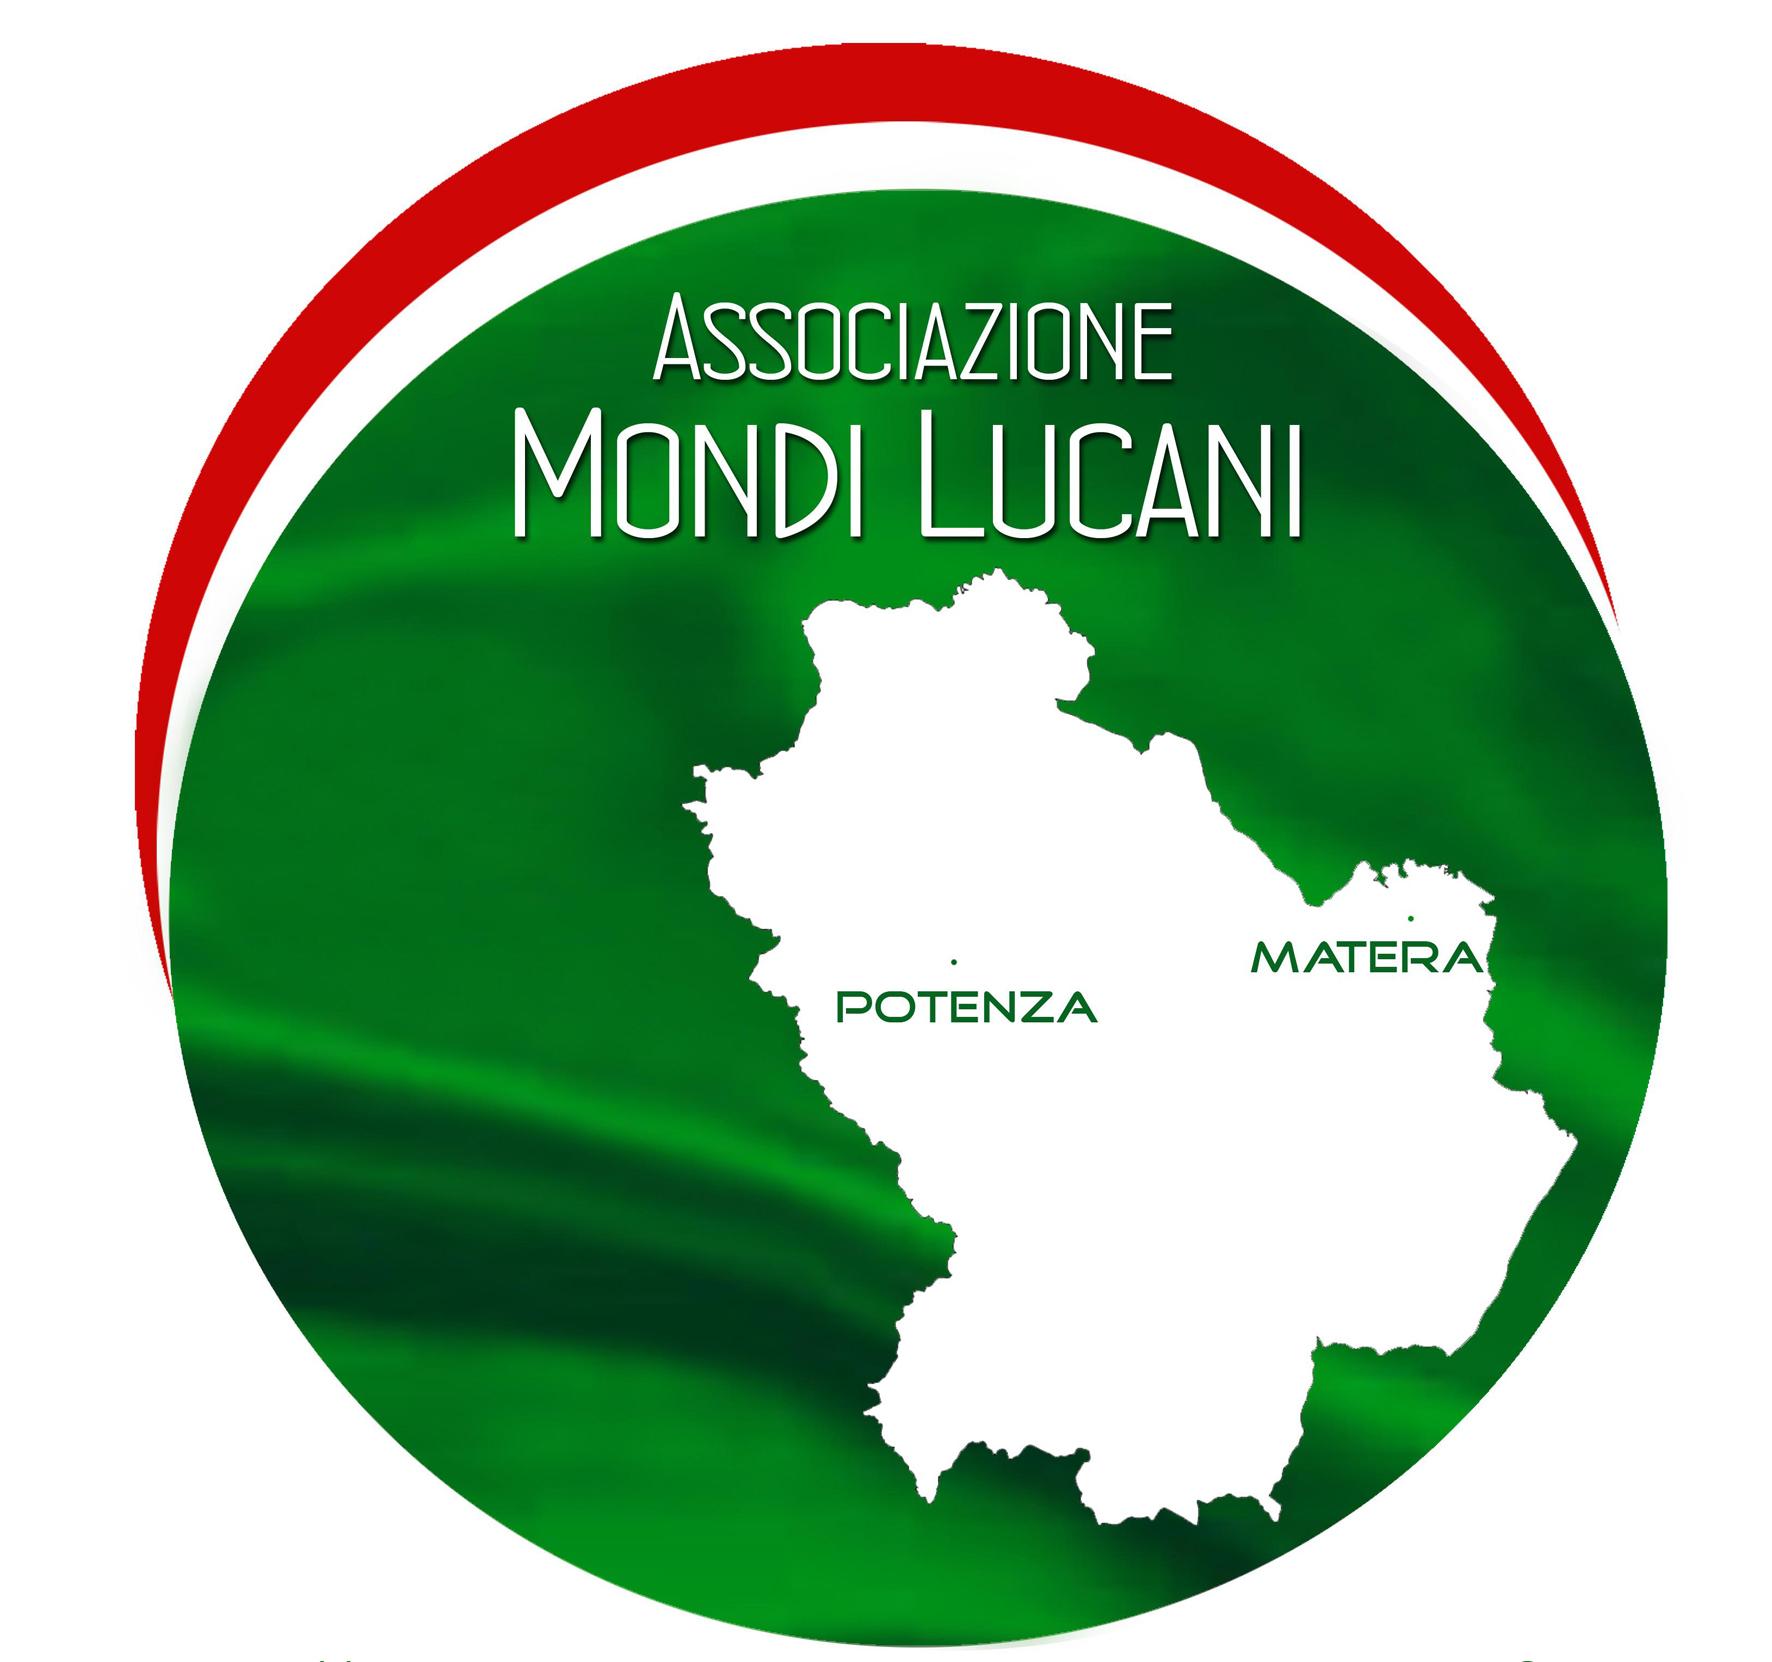 www.mondilucani.it